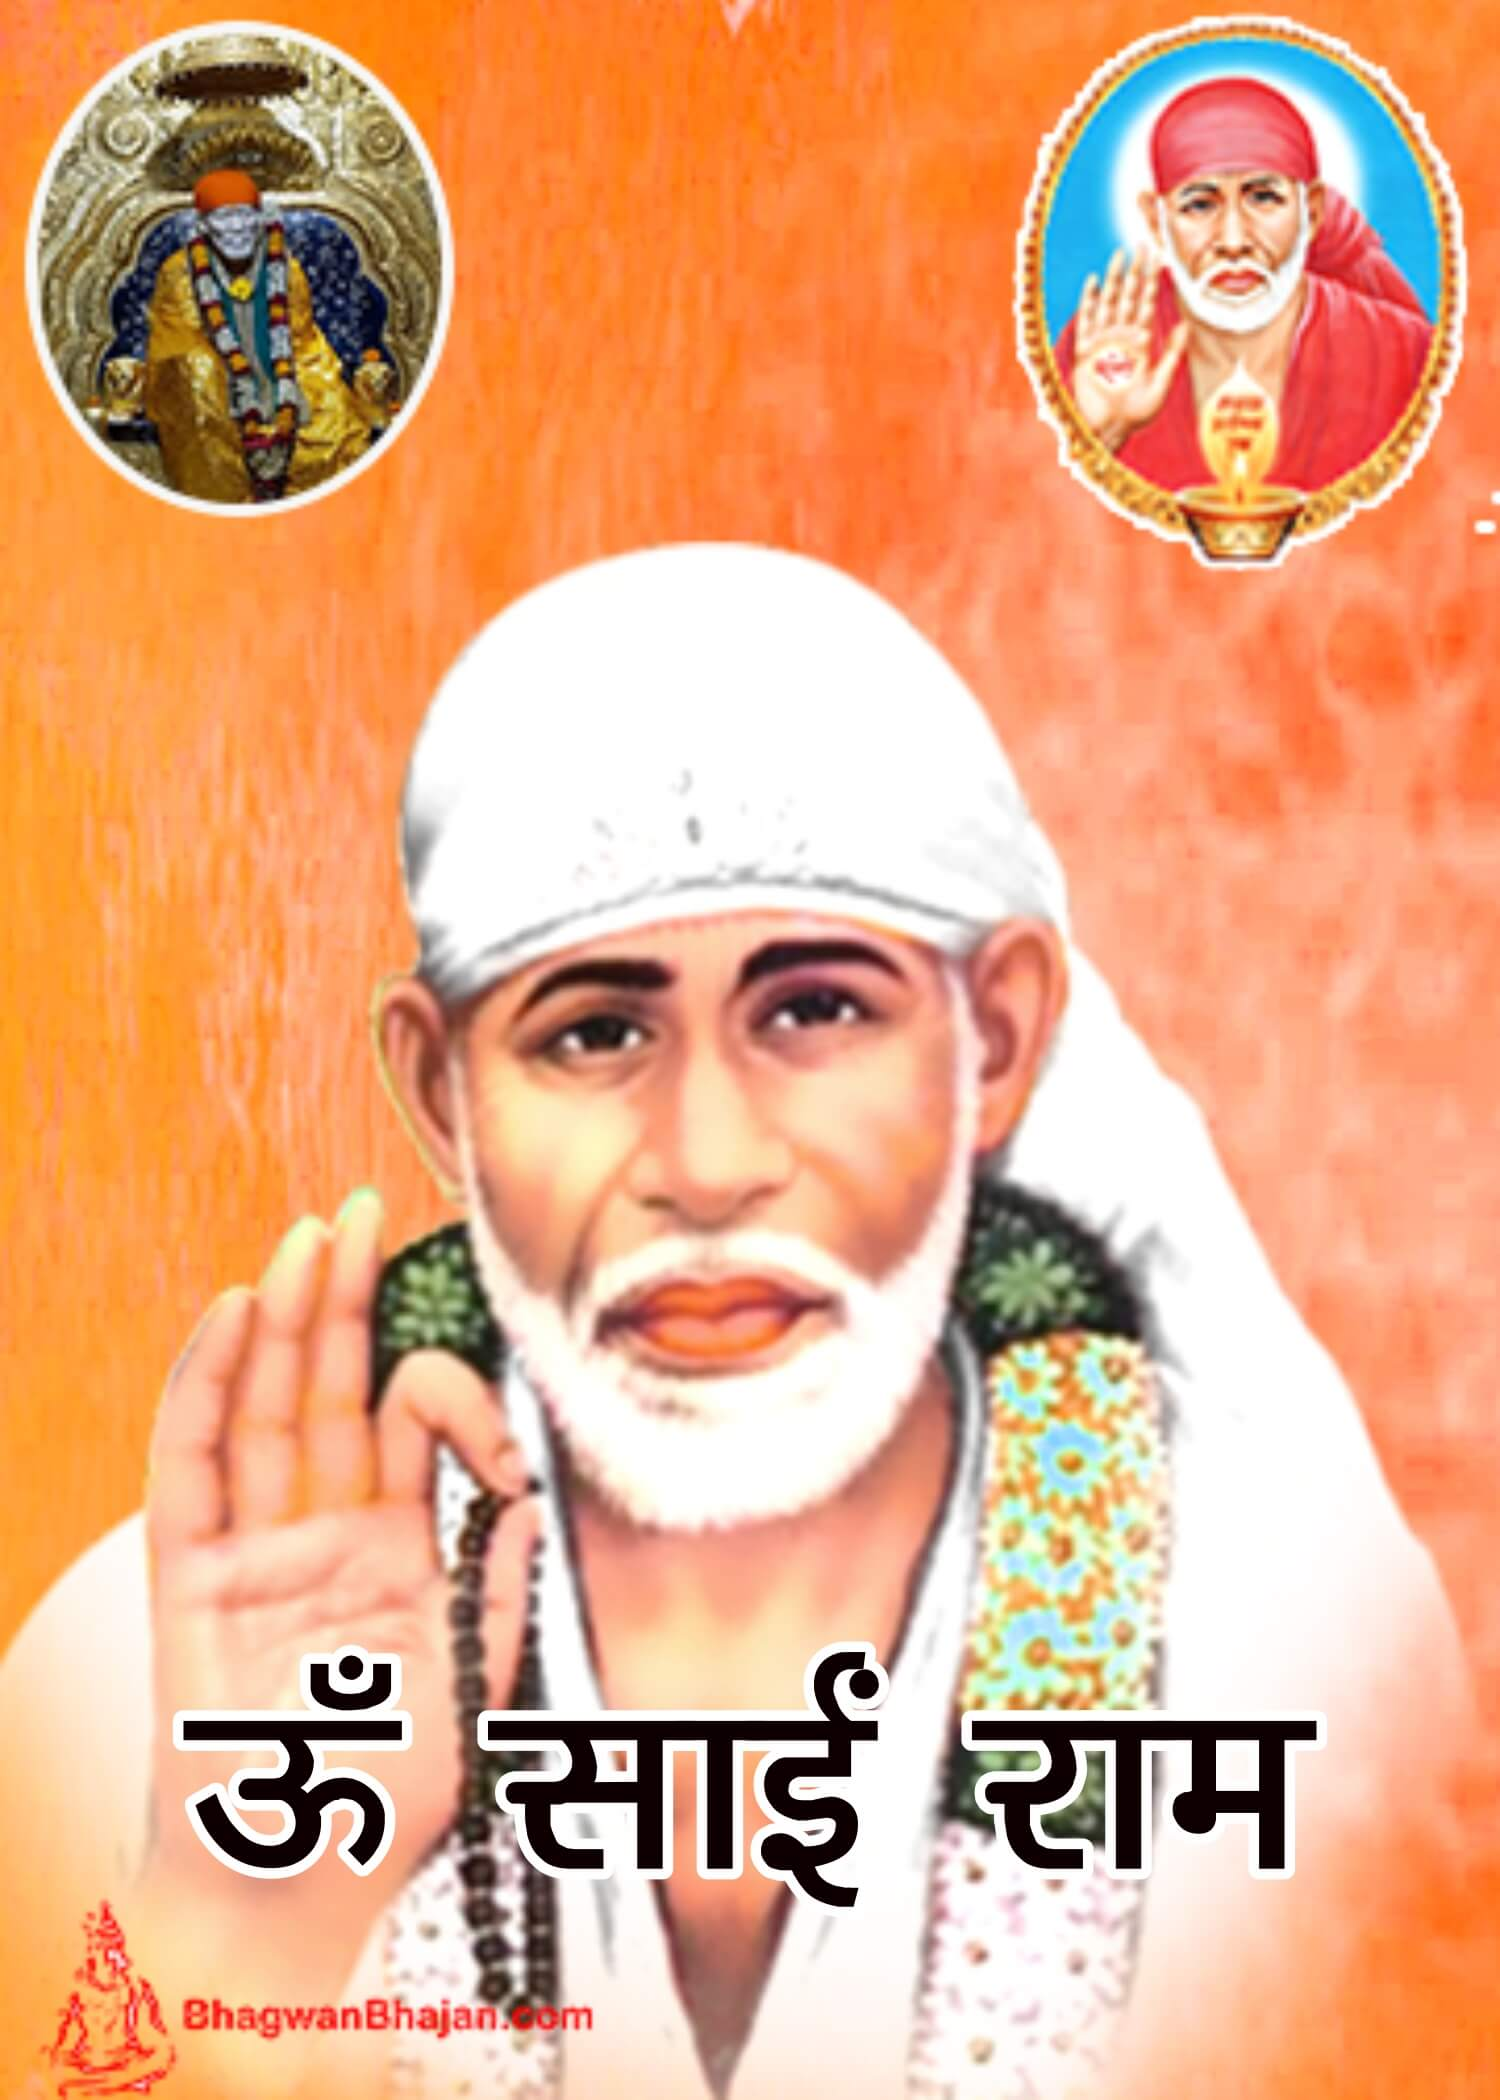 Bhagwan Sai Ram Whatsapp Status Wallpaper And Images - Sai Baba Of Shirdi , HD Wallpaper & Backgrounds